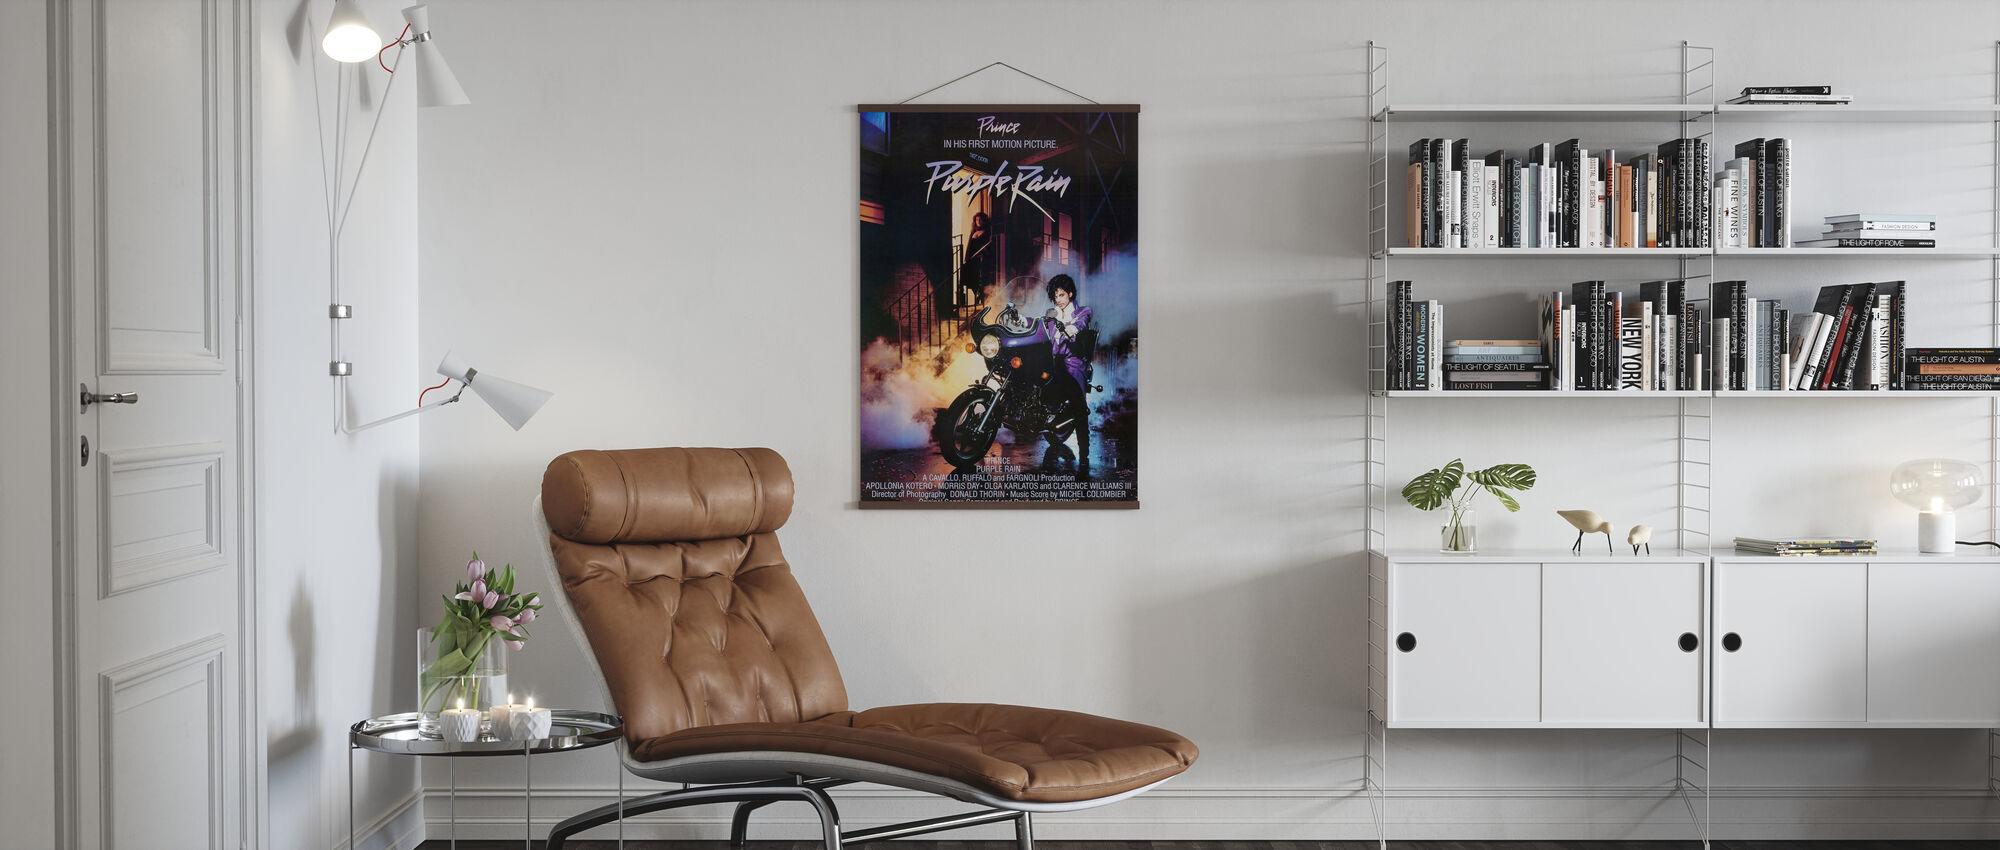 Prince in Purple Rain - Poster - Living Room